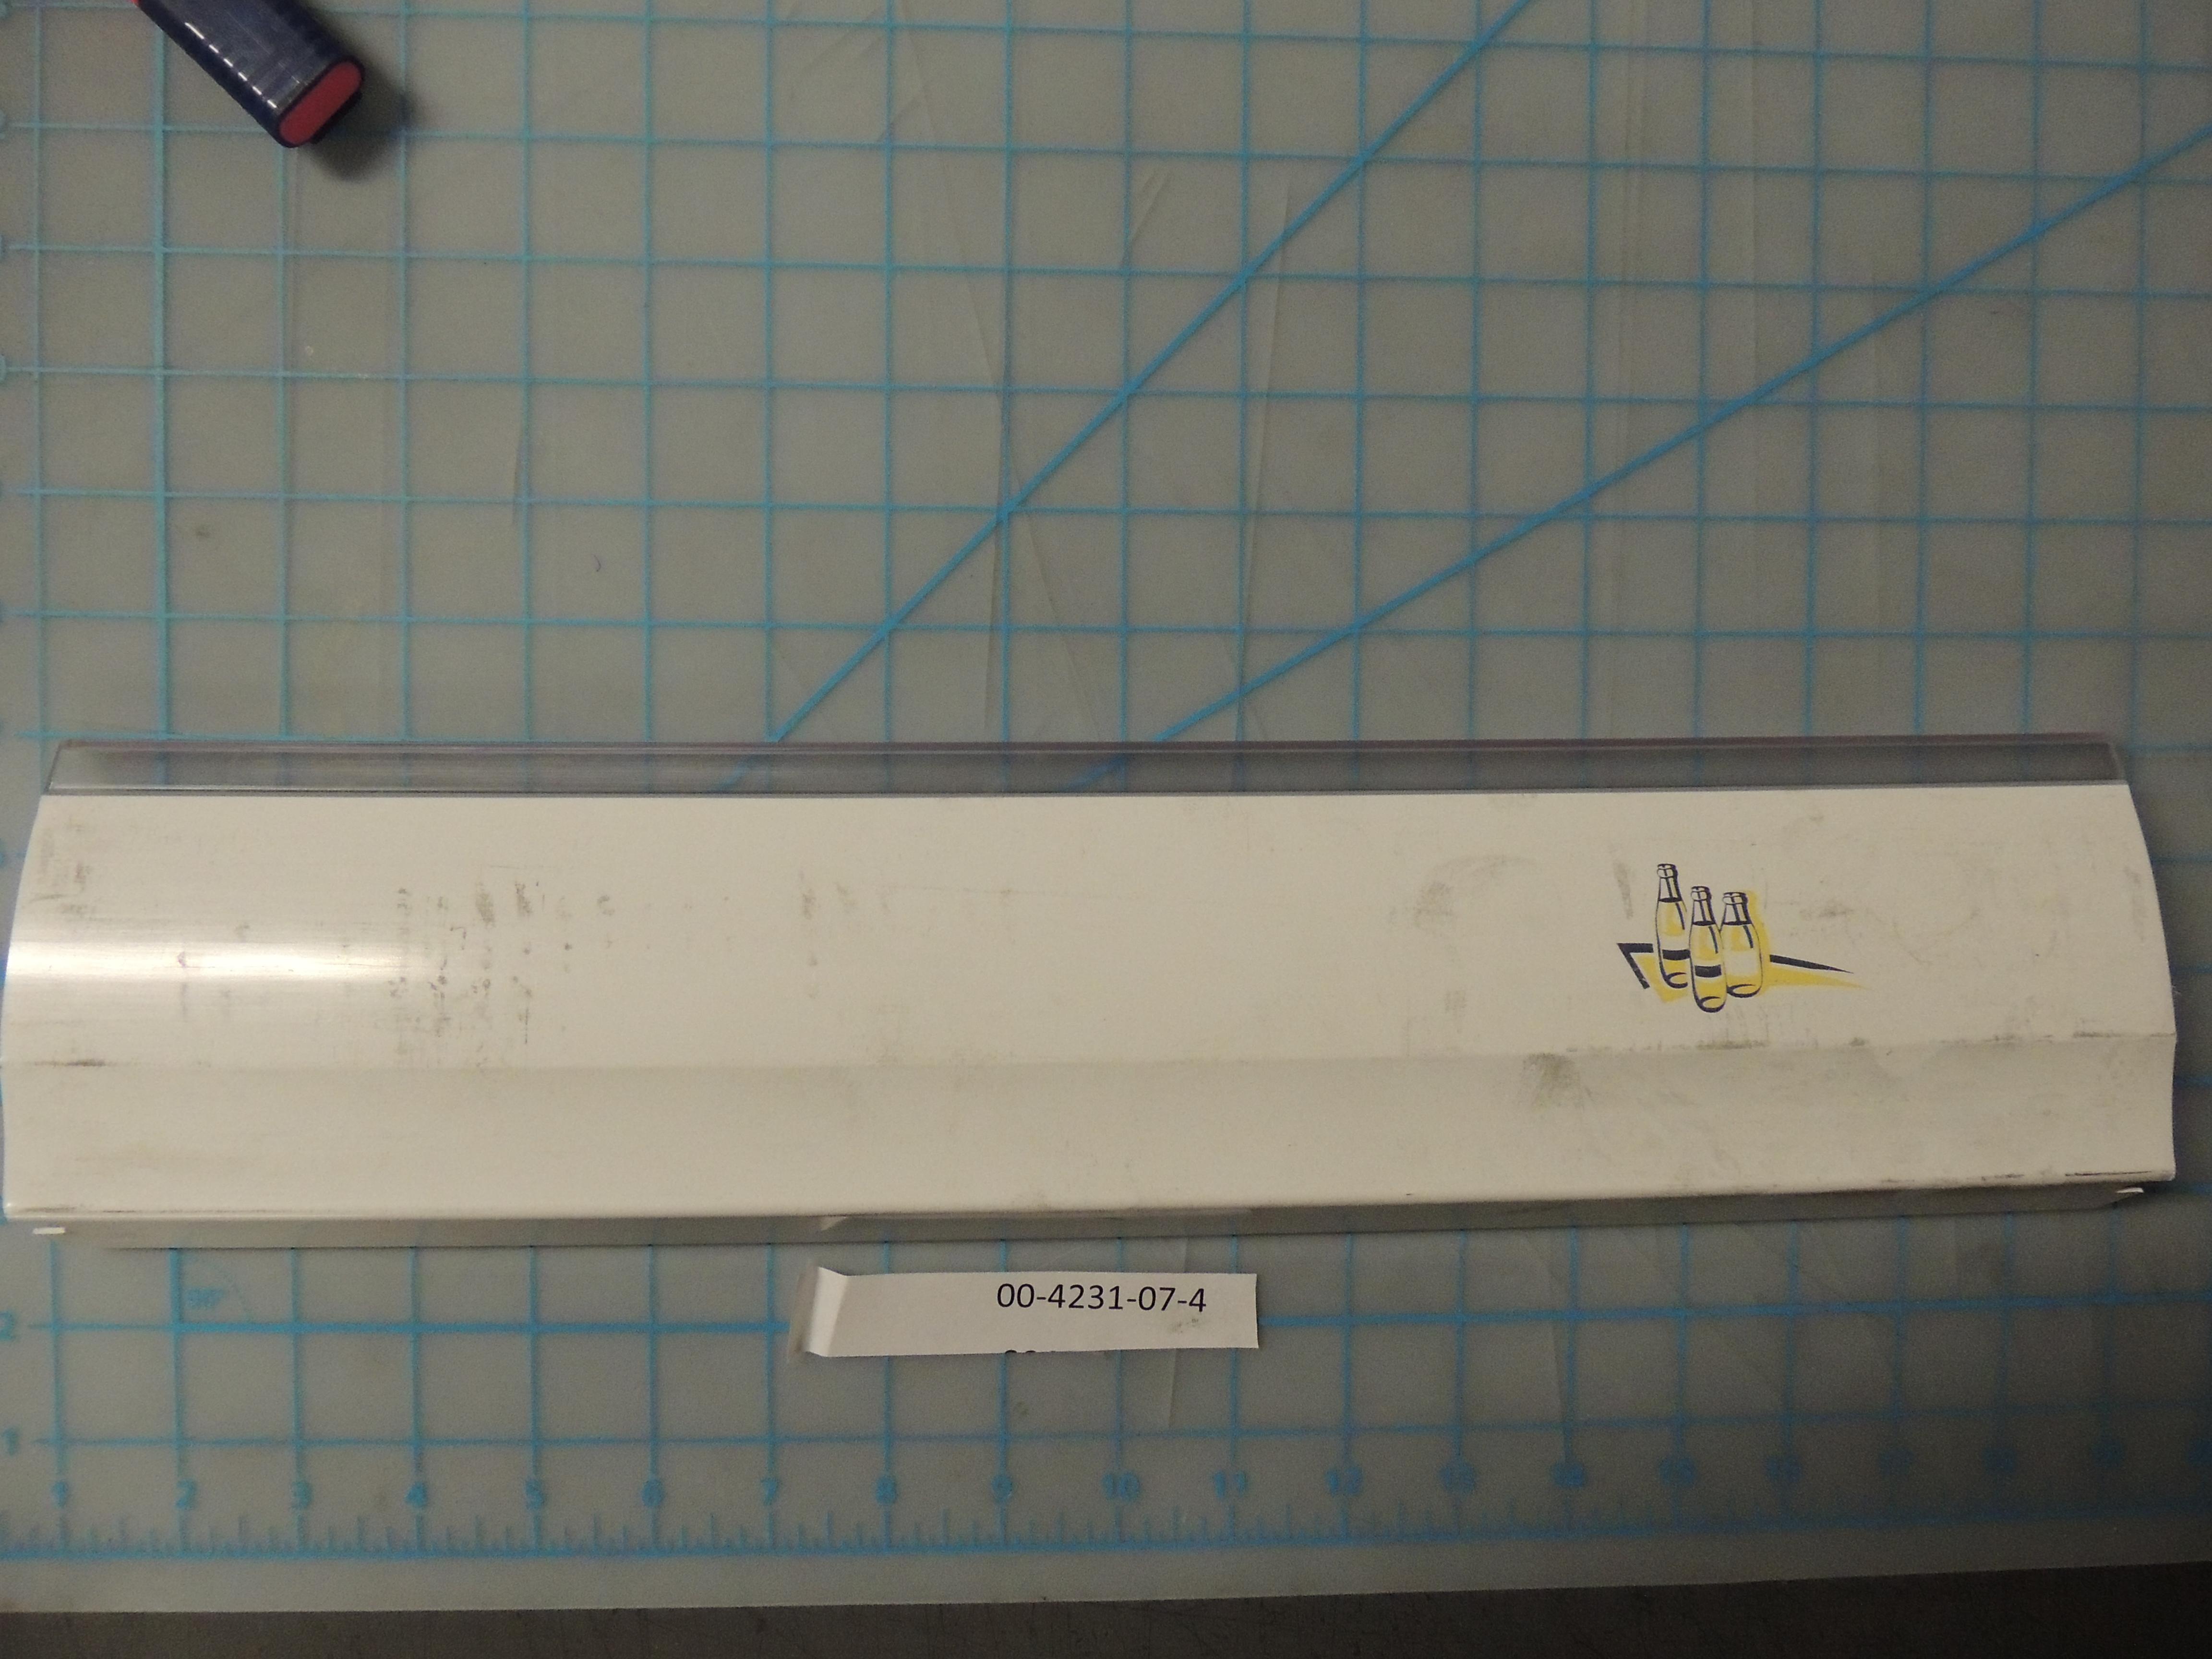 DPR2260 LOWER SHELF GUARD